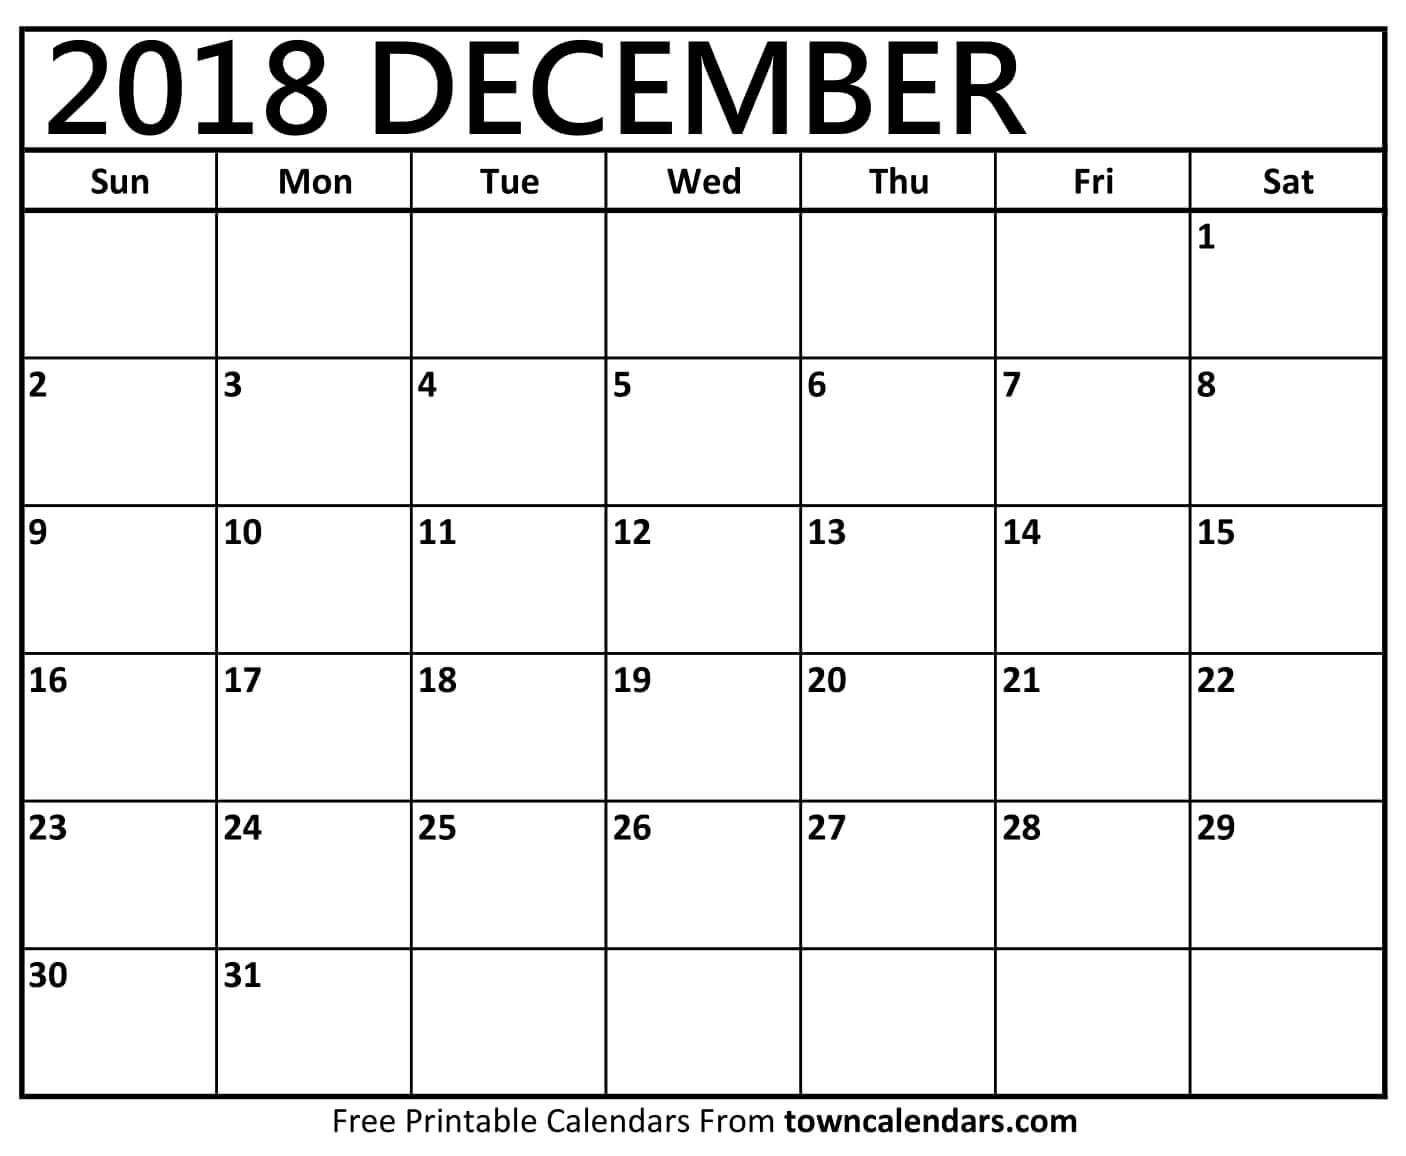 Printable December 2018 Calendar - Towncalendars